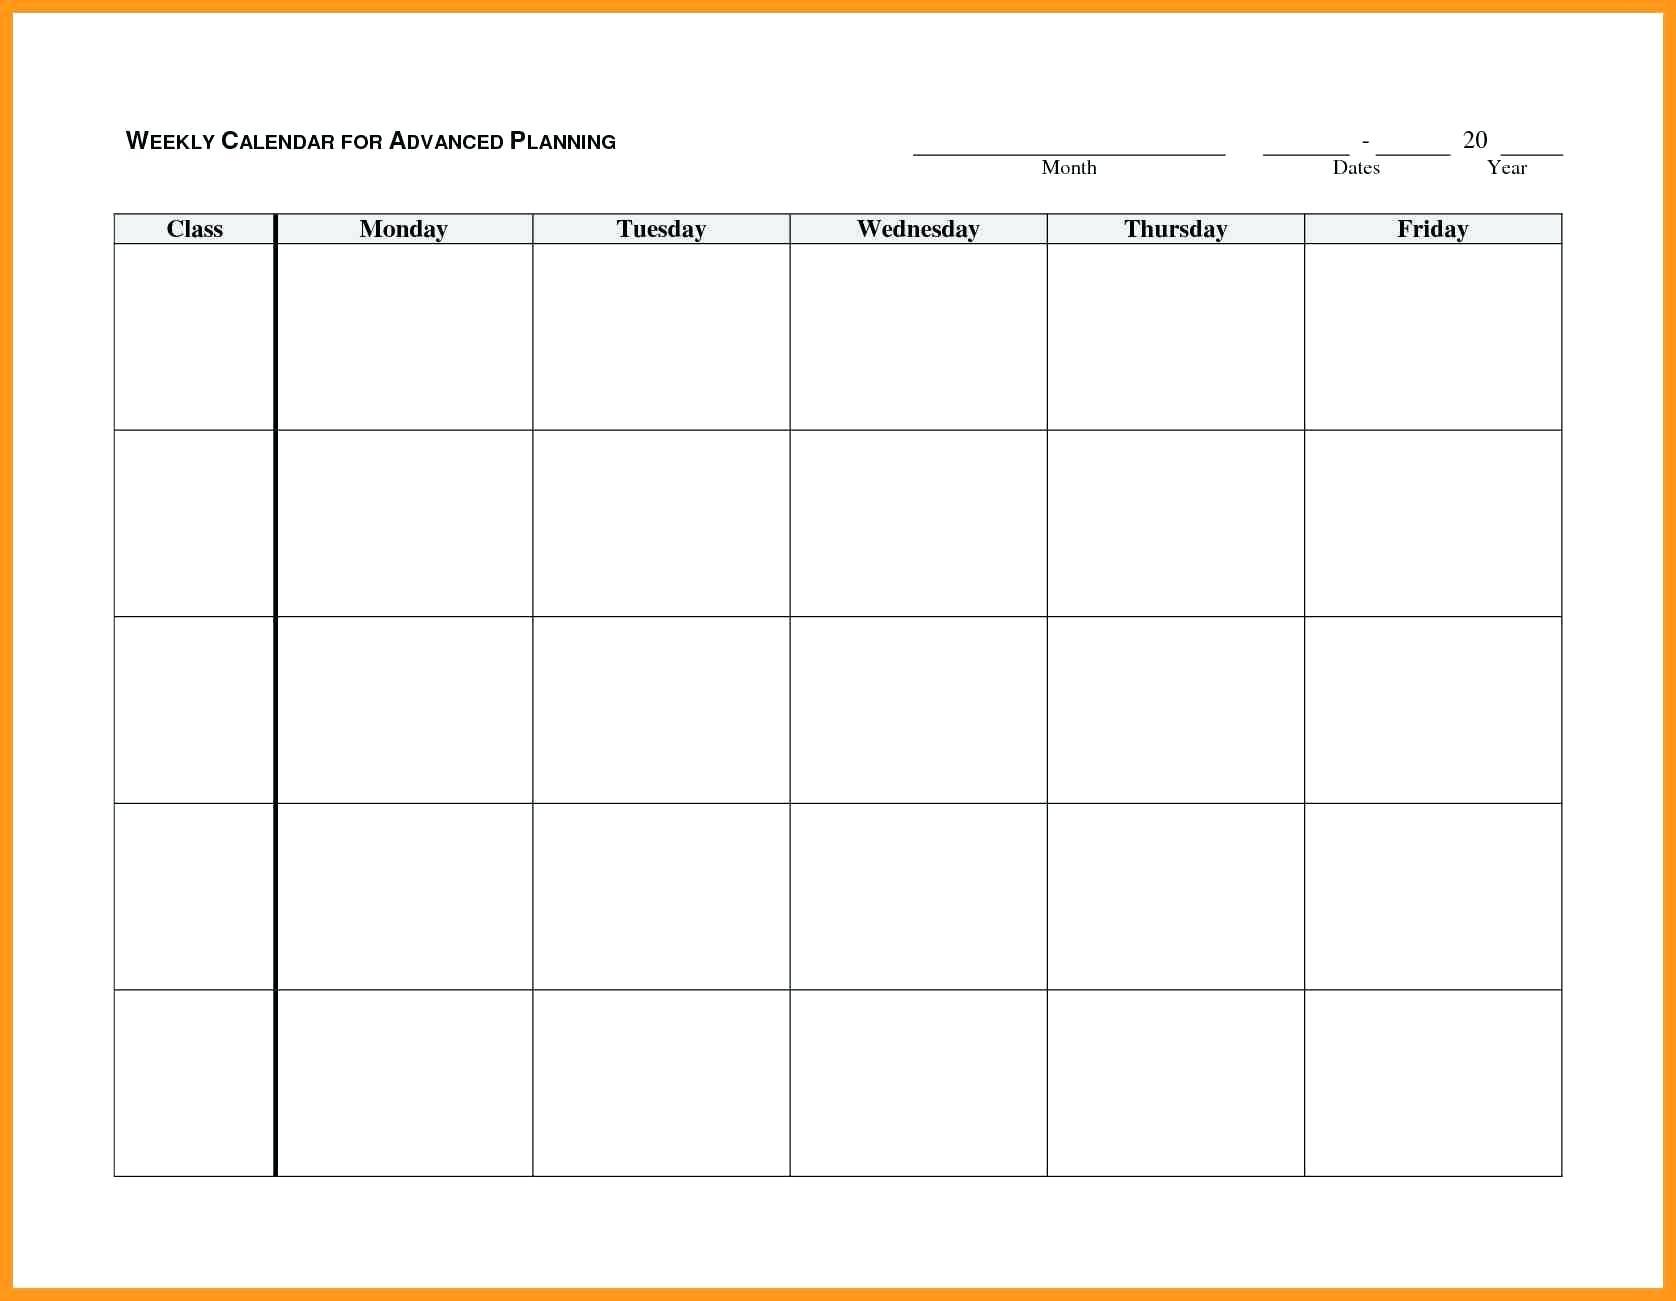 Blank Weekly Calendar Monday Through Friday Schedule